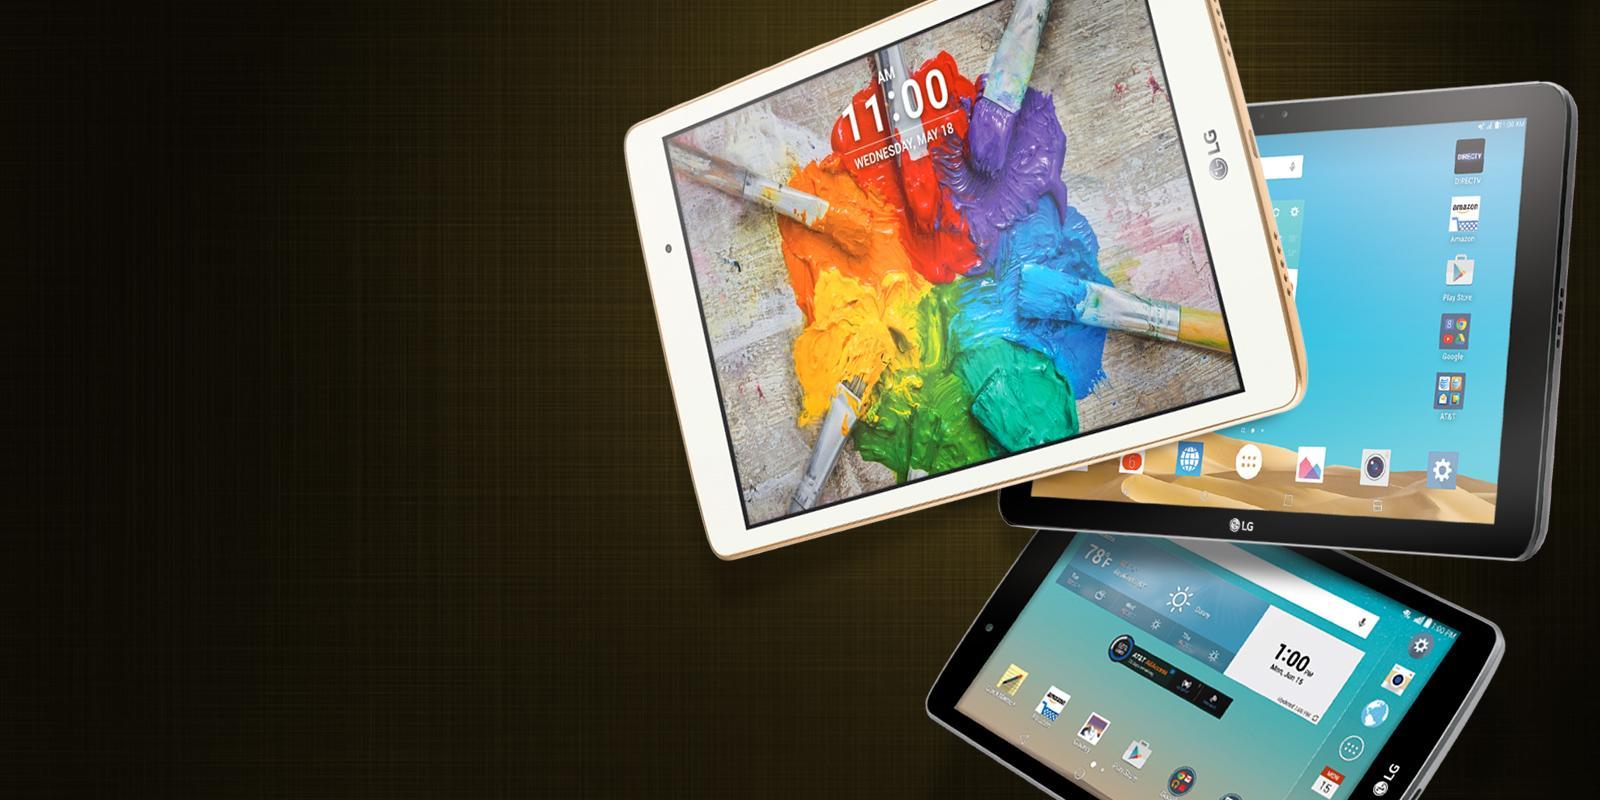 lg tablet, lg tablets, lg lte tablets, lg wifi tablets, tablets, tablet, android tablet, android tablets, lg tablet, lg tablets